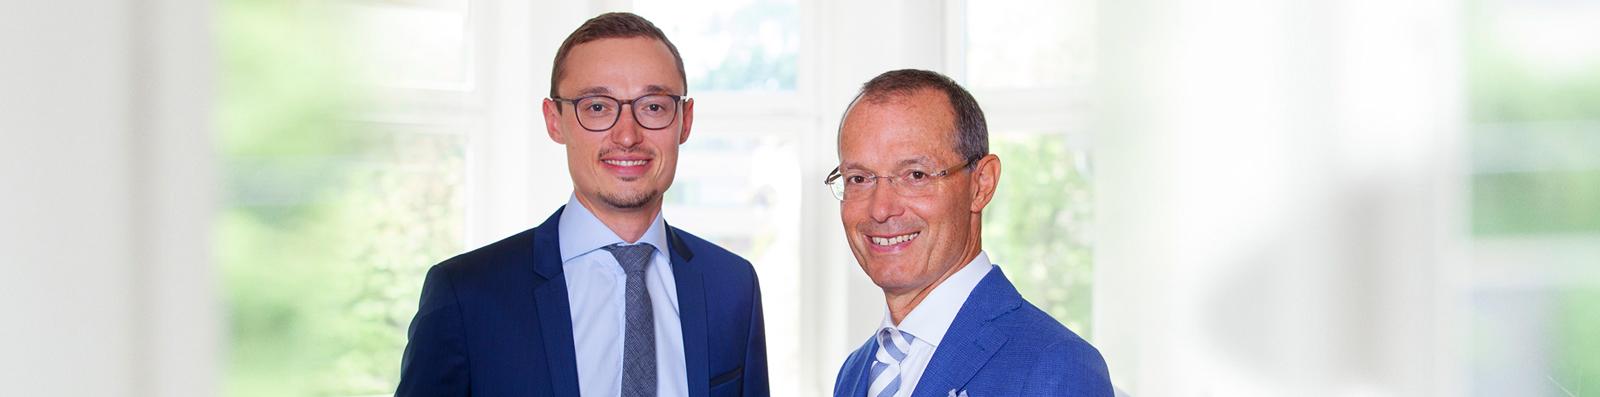 Kontakt Steuerberater Steinhart & Partner in Augsburg